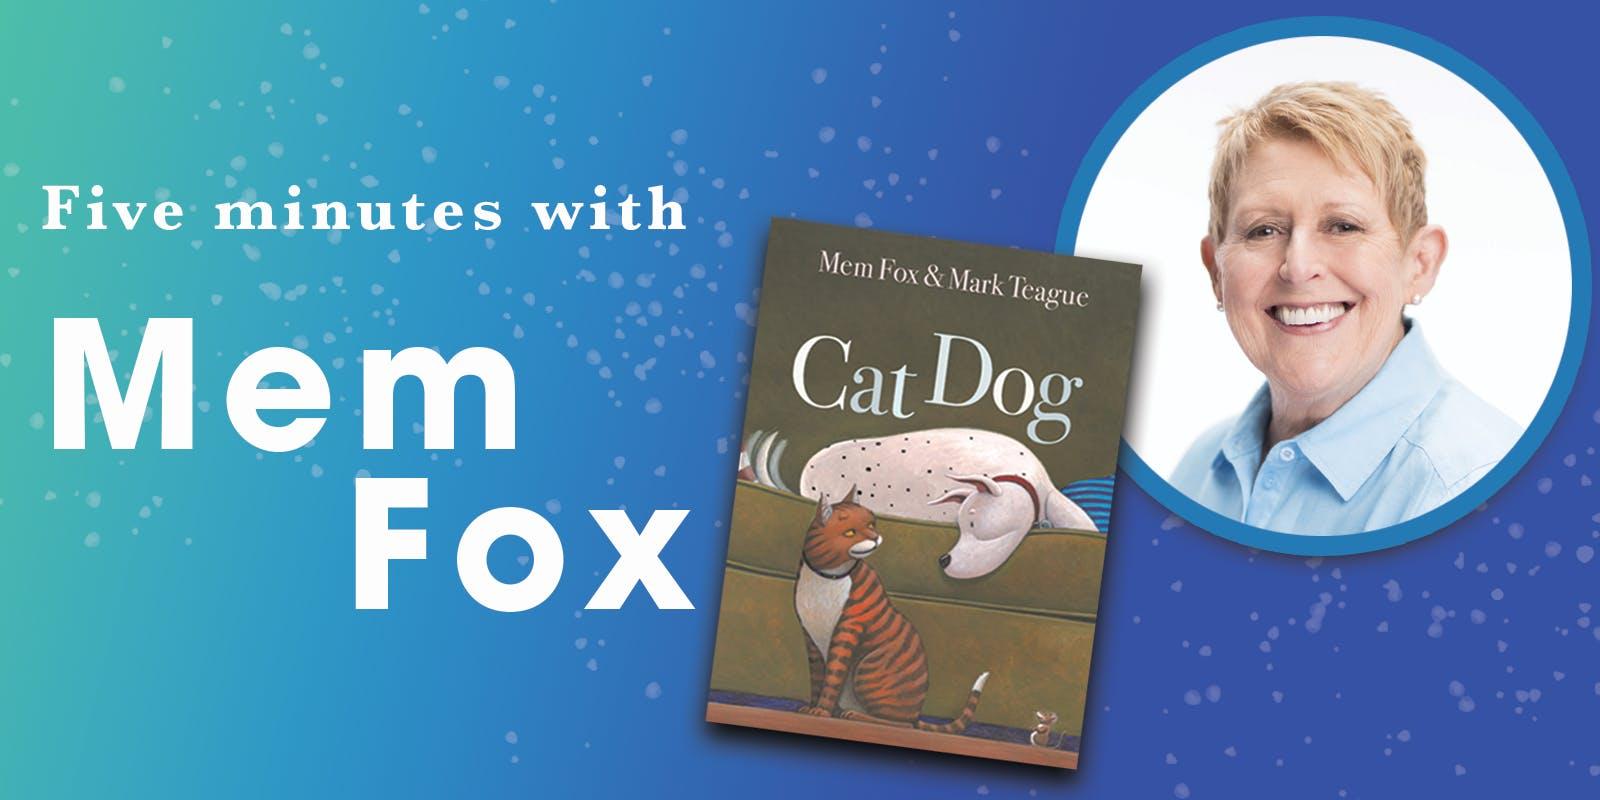 Five Minutes with Mem Fox